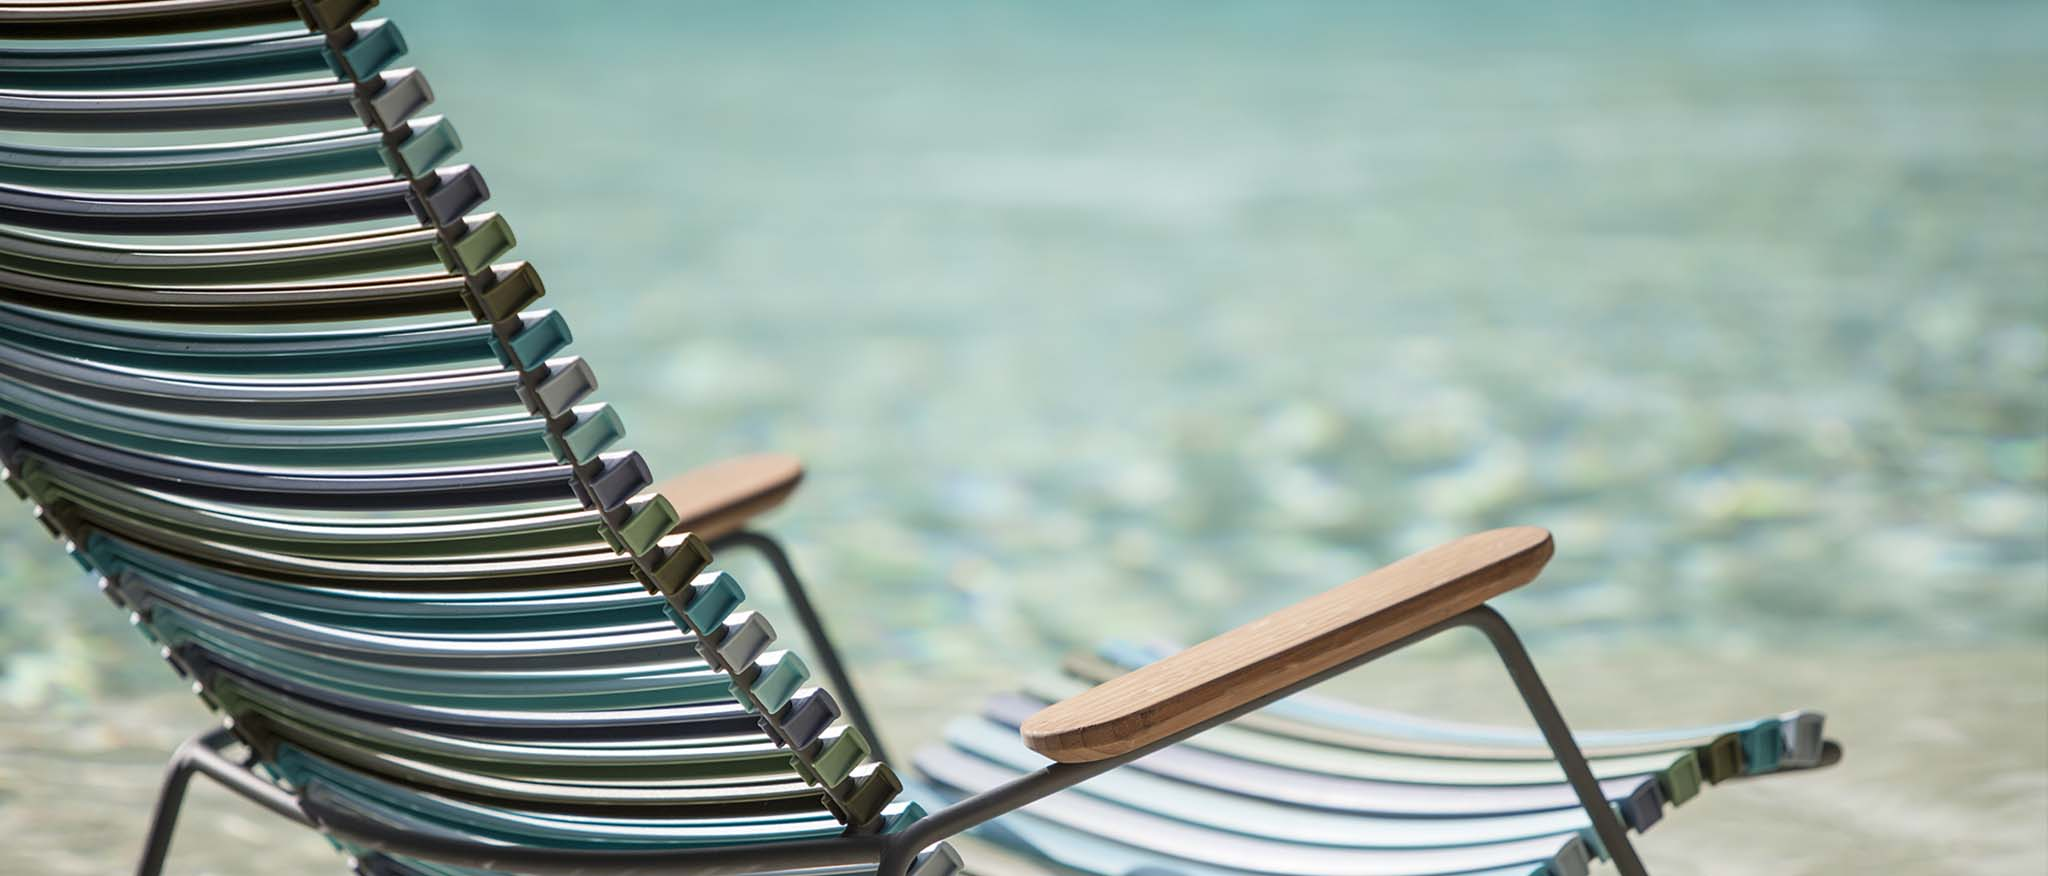 PLAYNK-lounge-chair.jpg